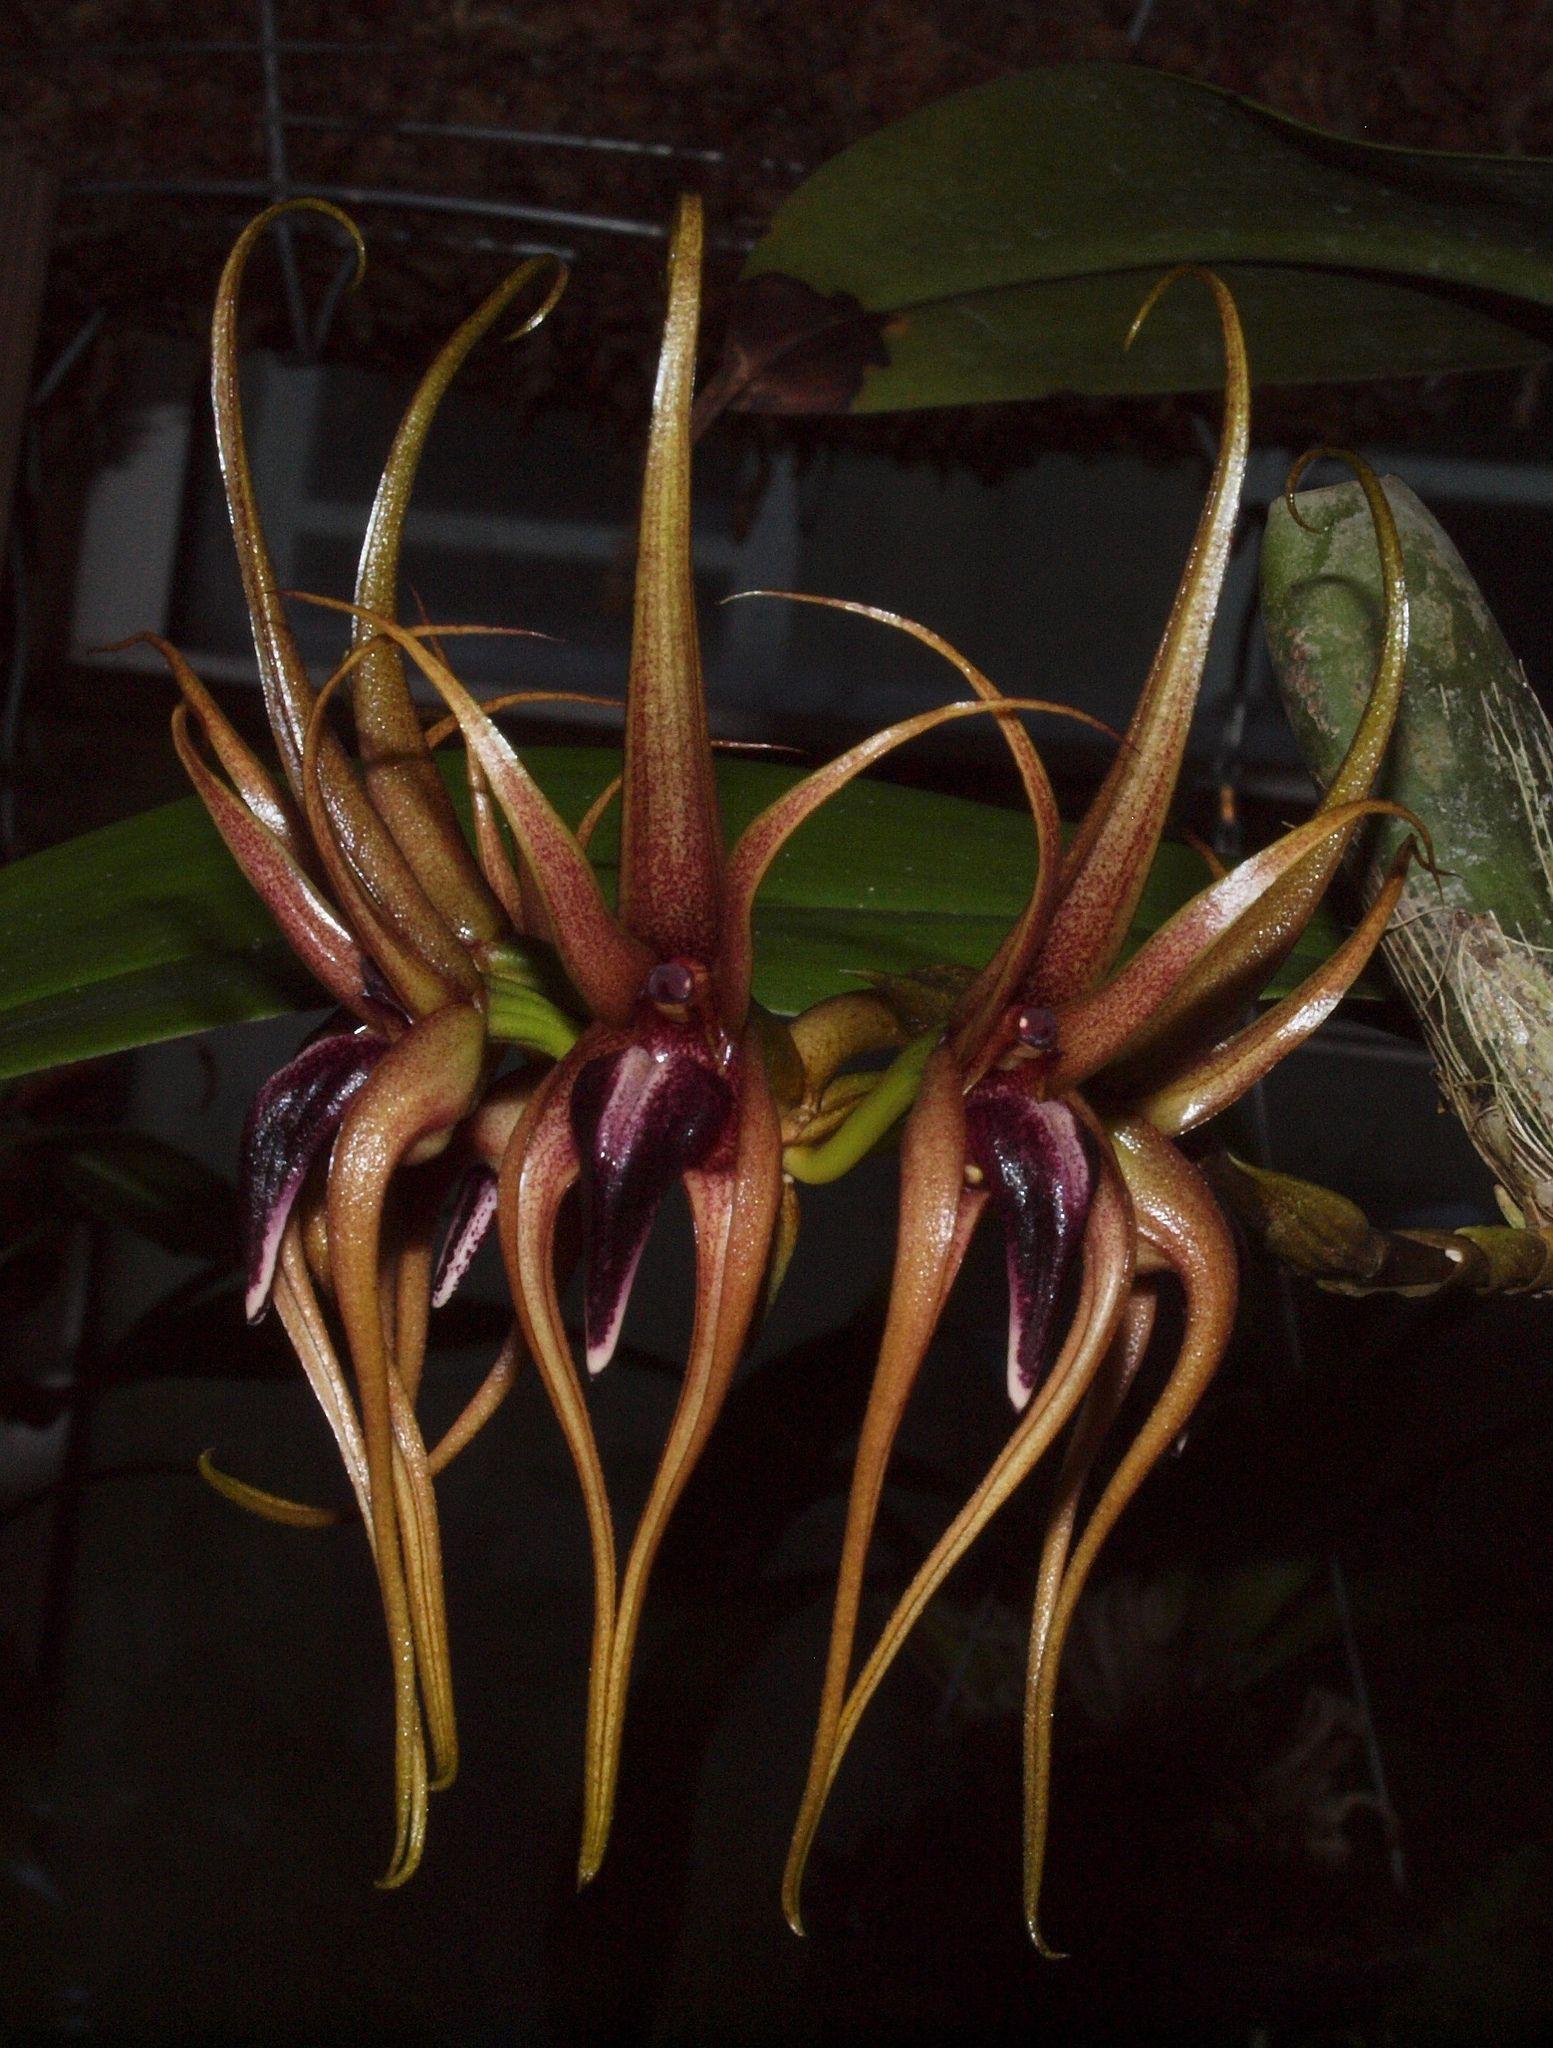 Bulbophyllum pahudii - Flickr - Photo Sharing!